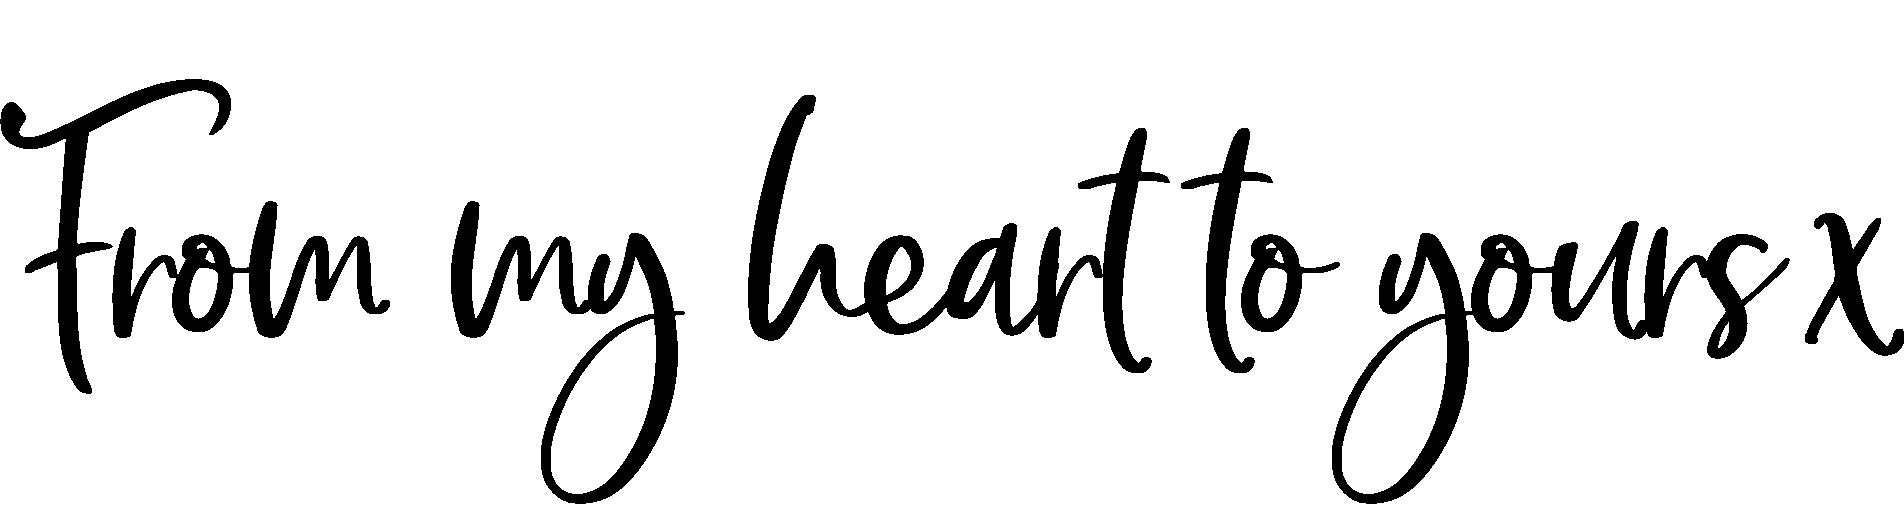 alysz-01